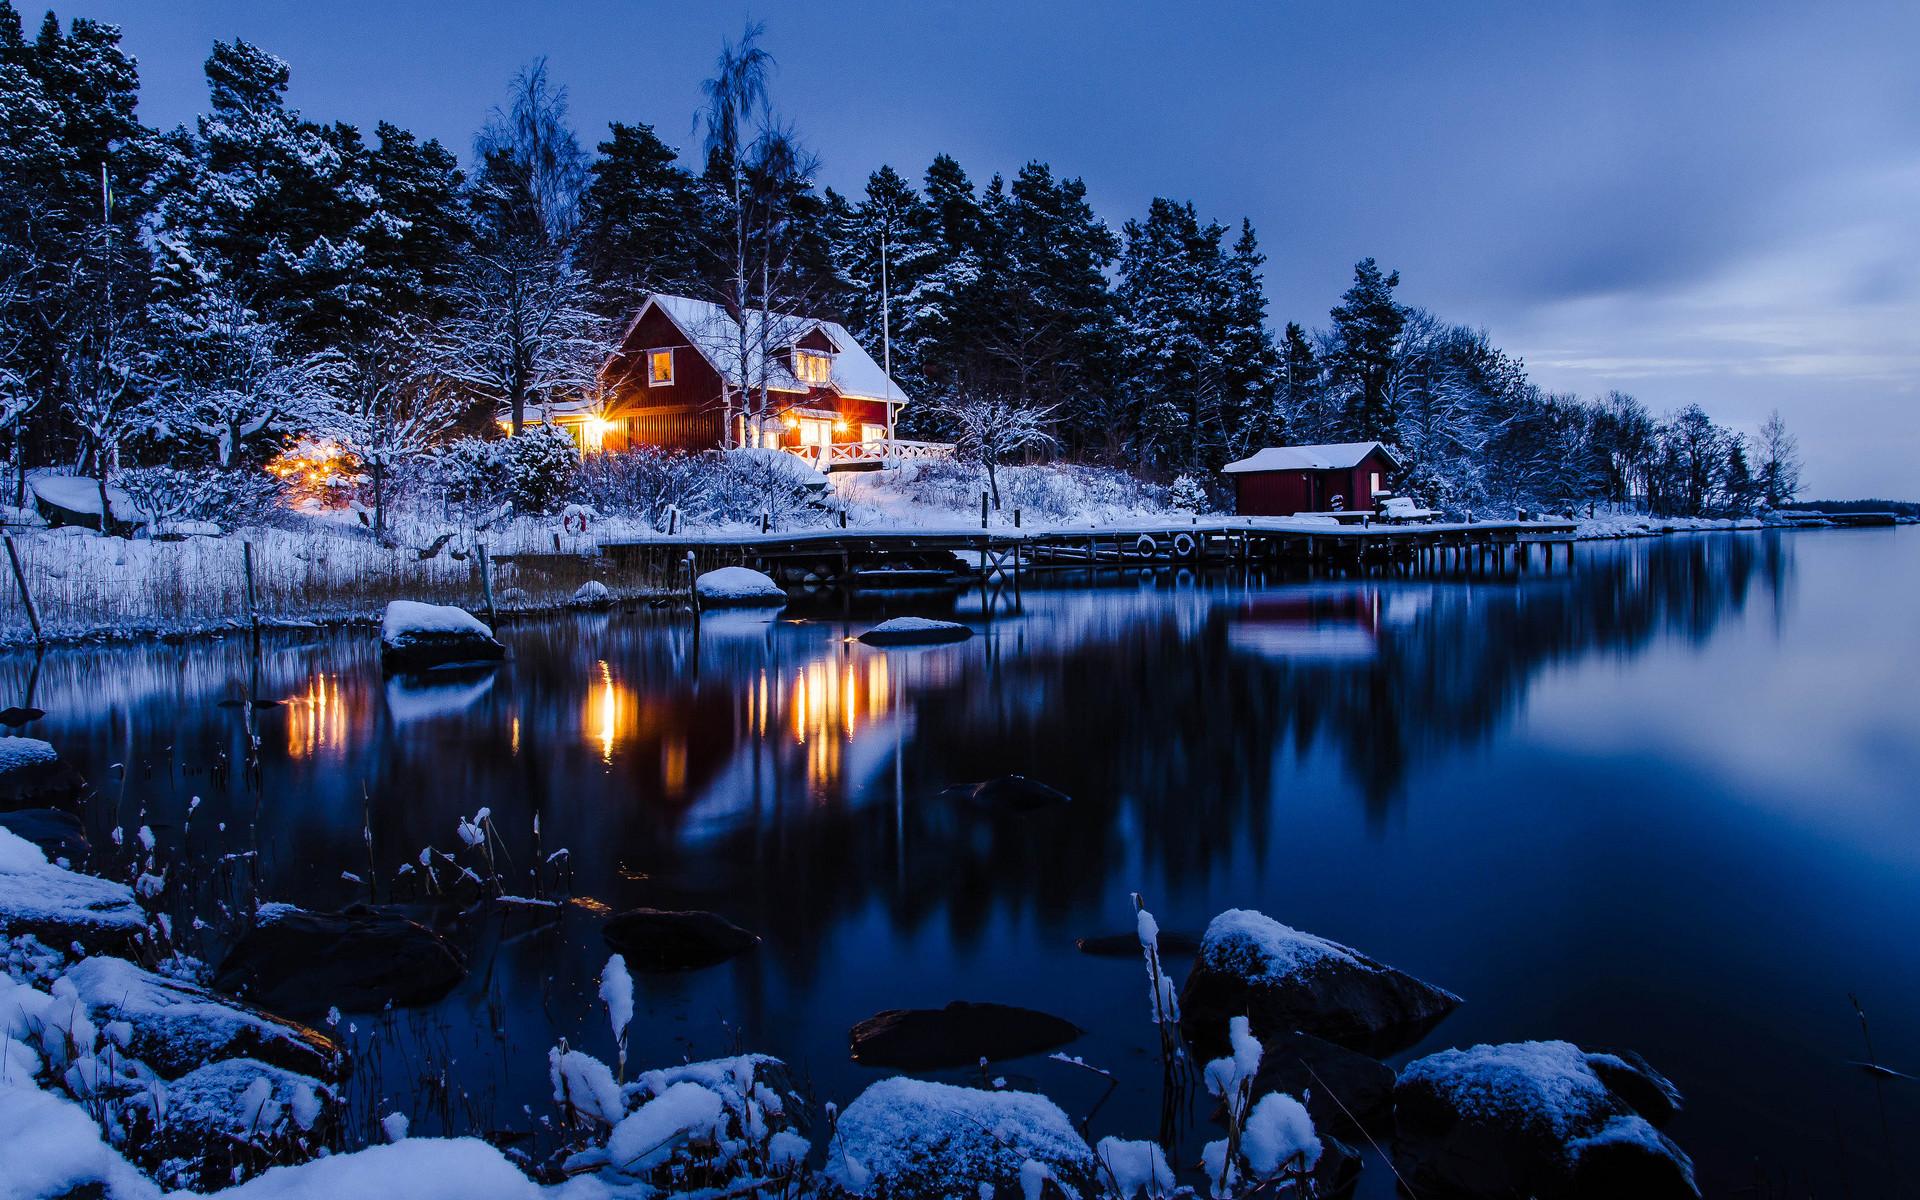 Winter Wonderland Desktop Wallpaper (47+ images)